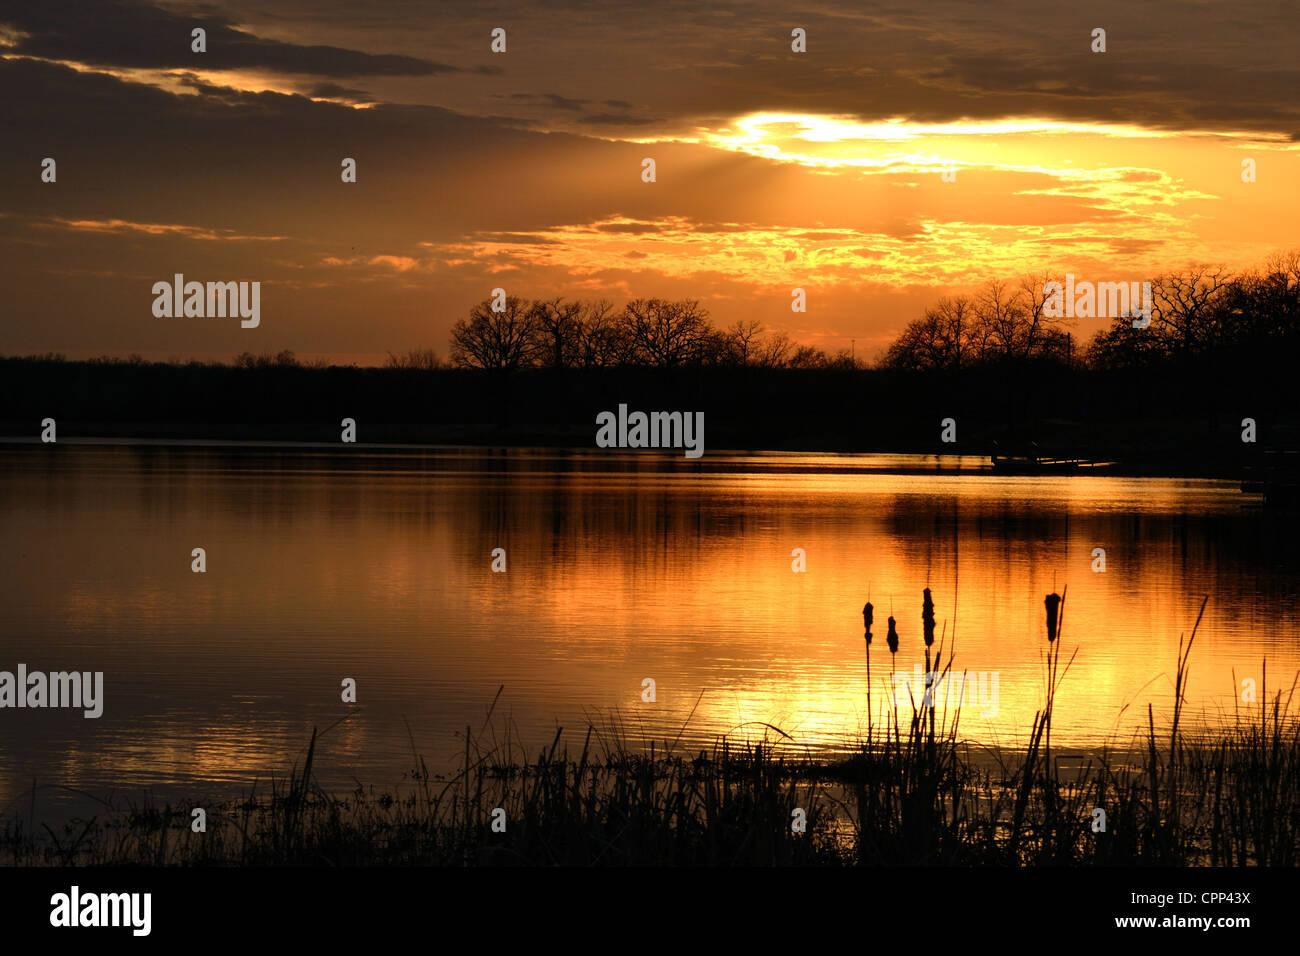 Sunset on Pretty Water Lake near Sapulpa, Oklahoma - Stock Image